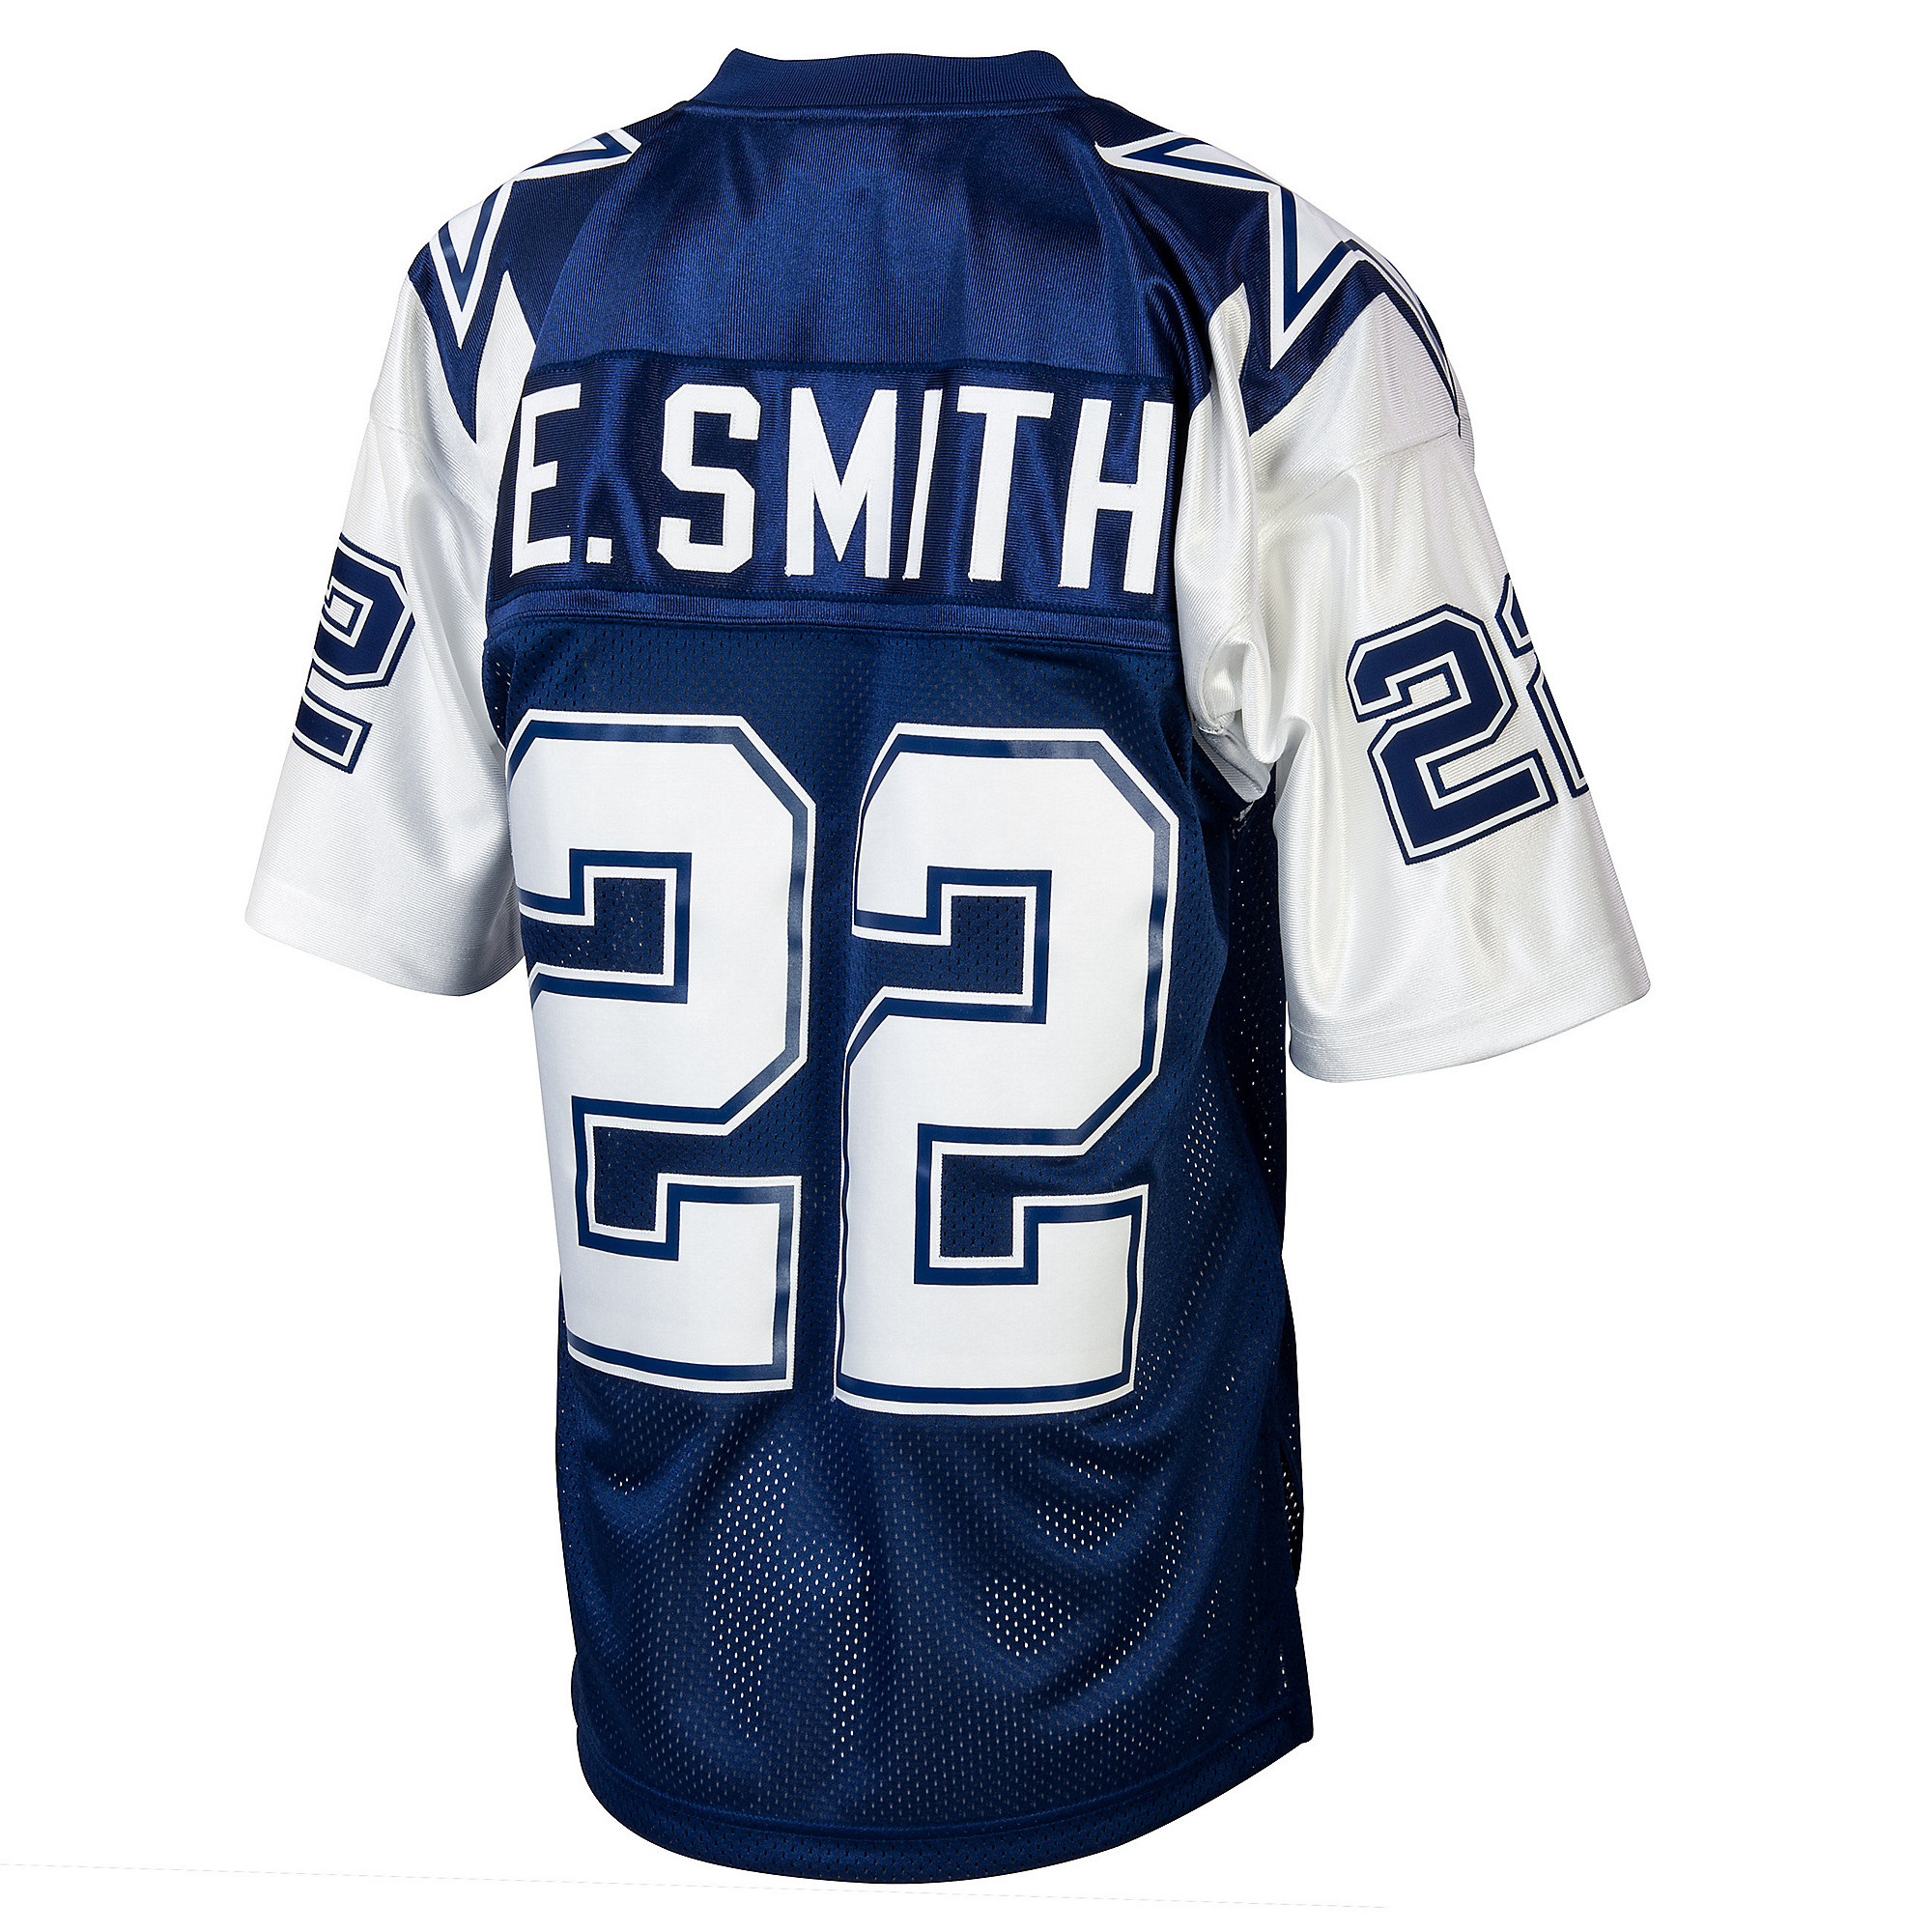 official photos 8e646 2f5ef Dallas Cowboys Emmitt Smith 1995 Mitchell & Ness Double Star Jersey |  Dallas Cowboys Pro Shop